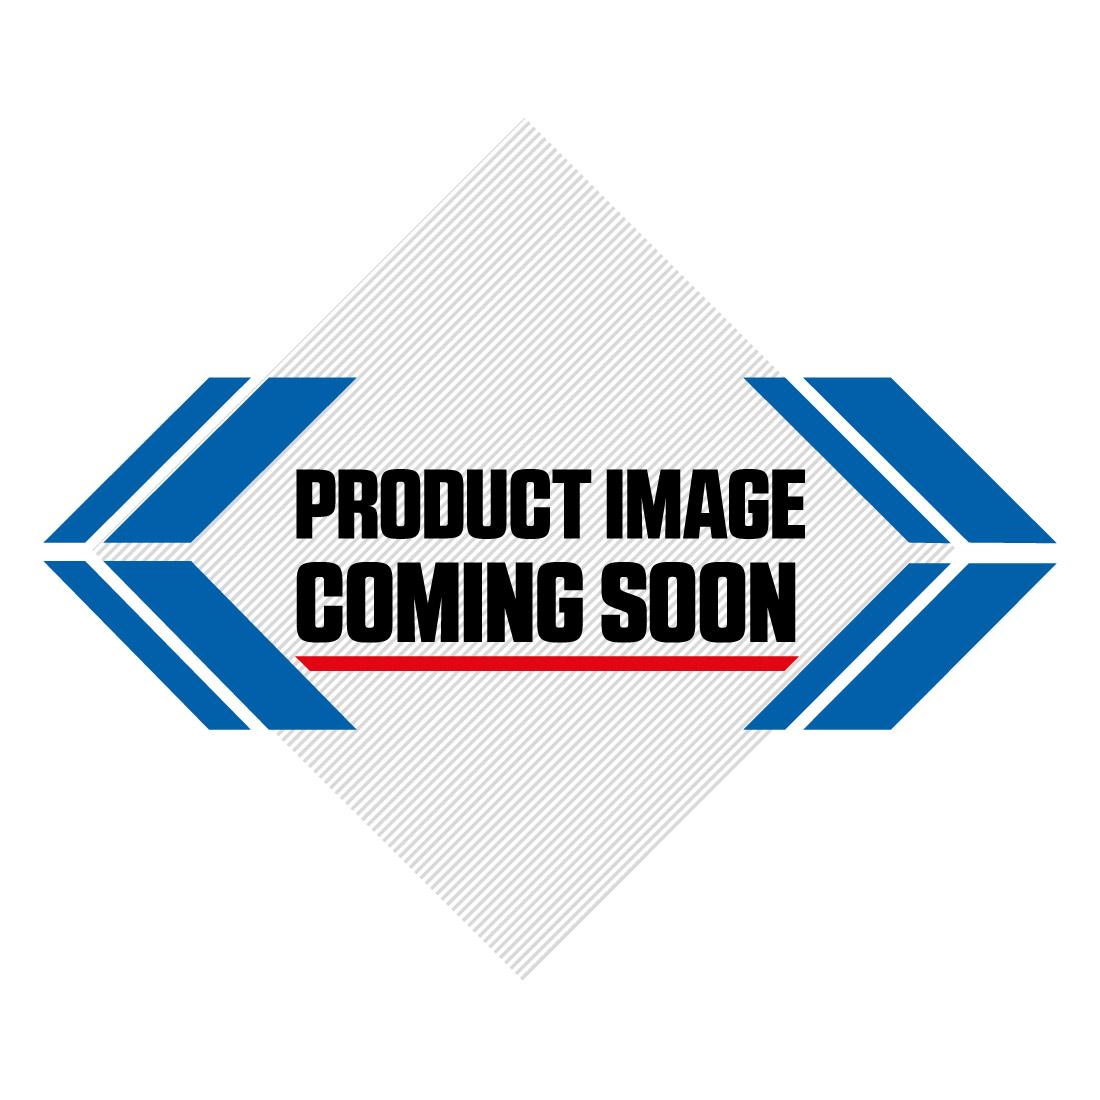 DJI Mavic Pro Fly More Combo 4K Quadcopter Drone Image-0